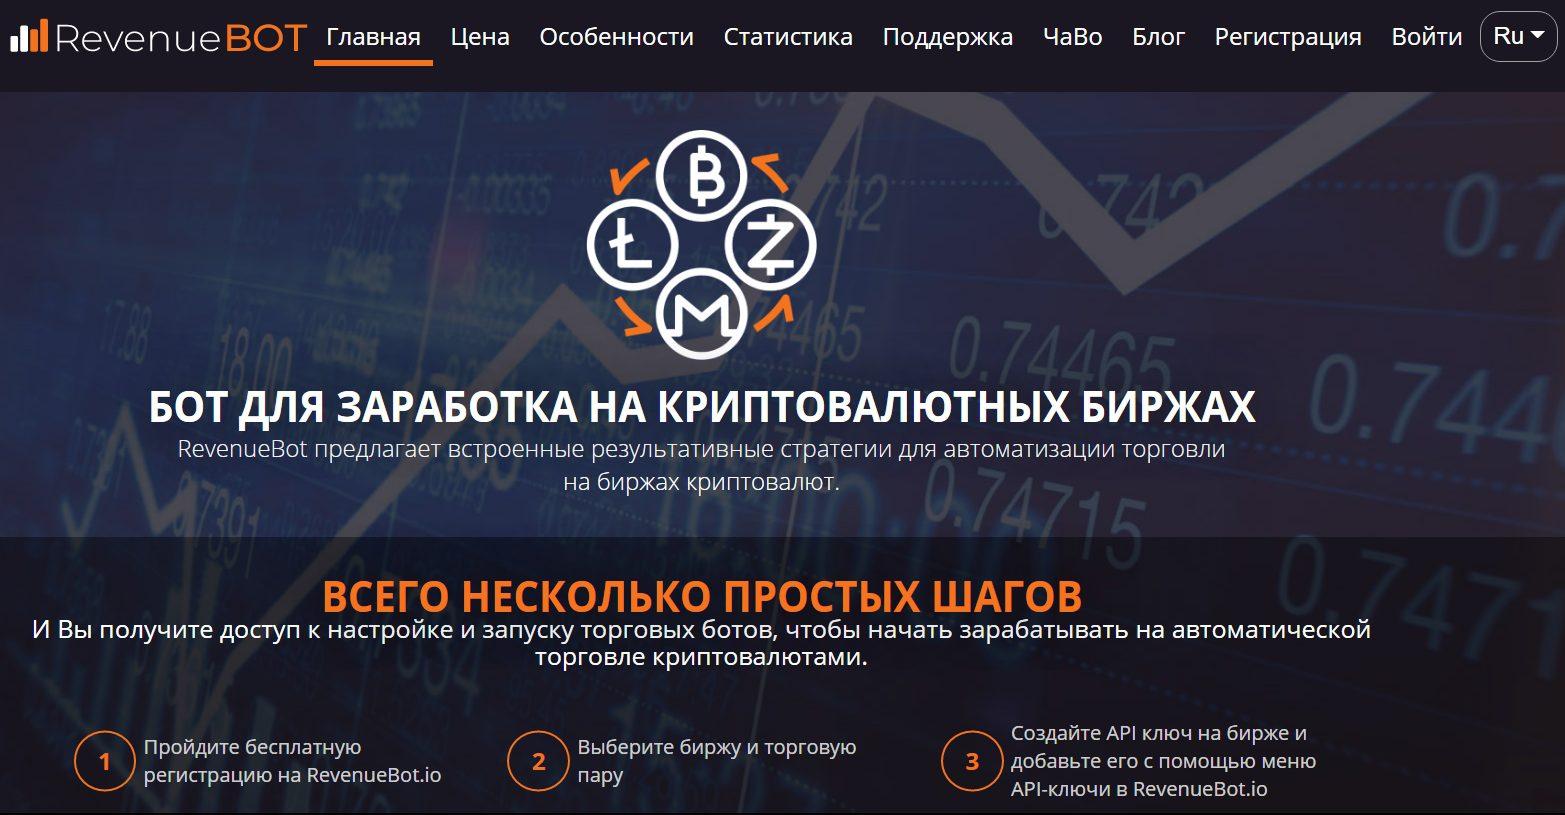 RevenueBot бот для заработка на крипте